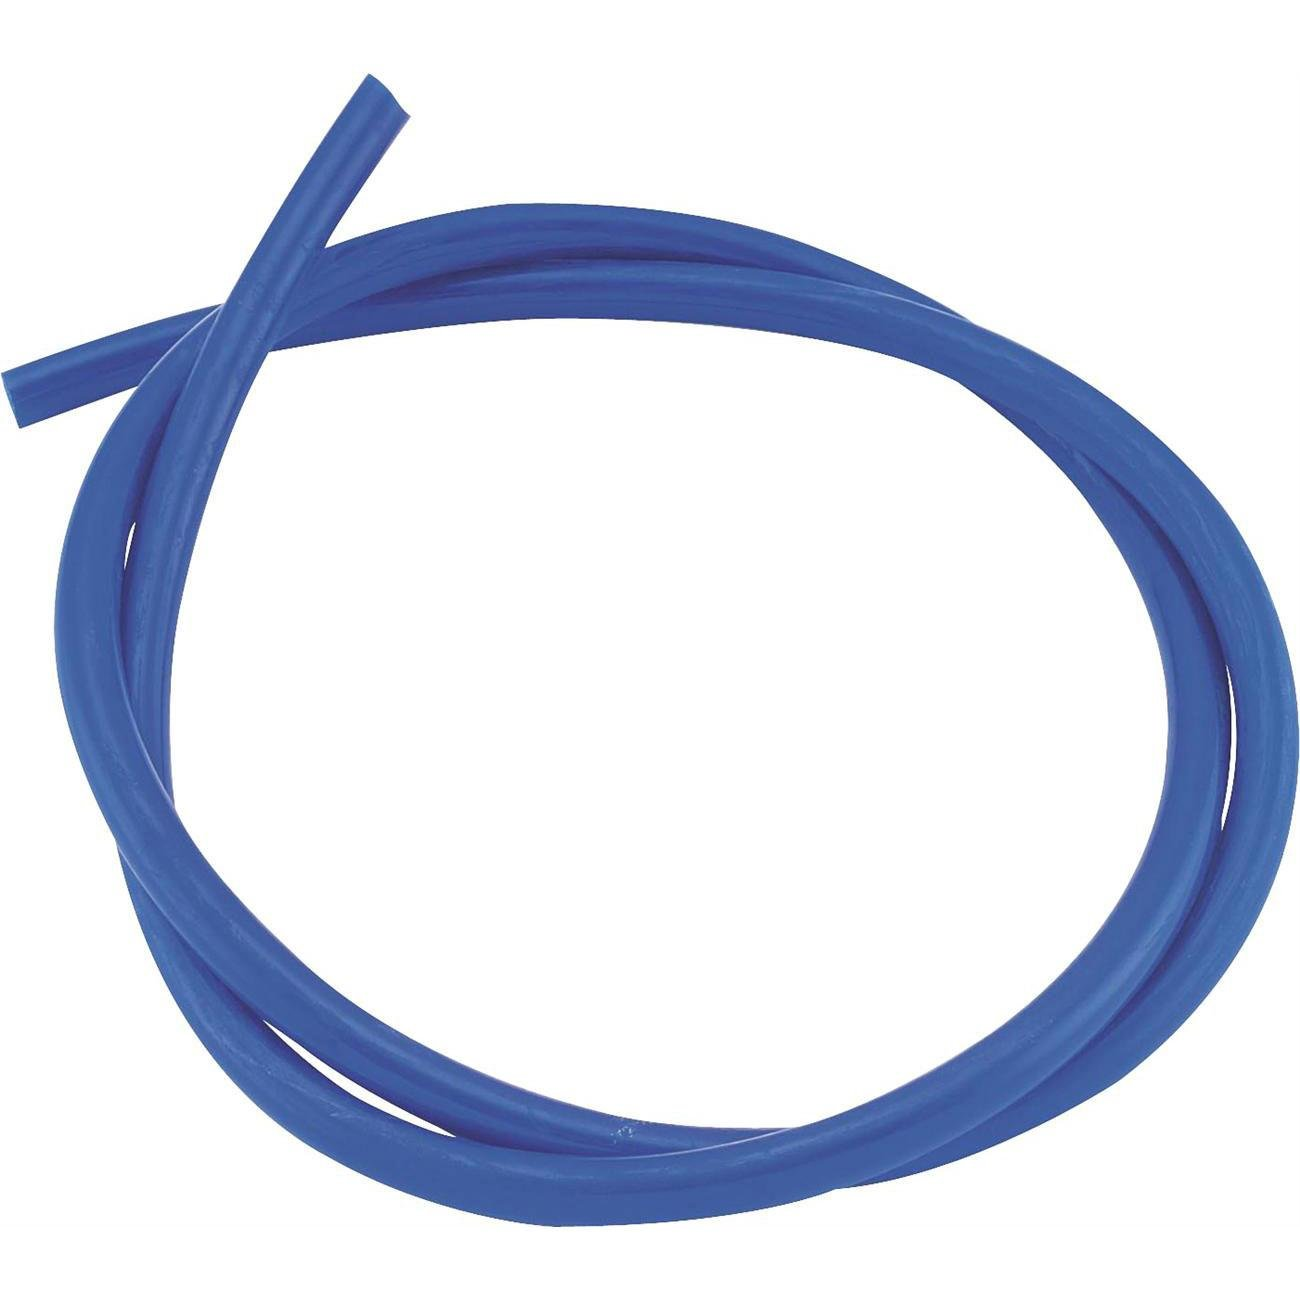 Helix Racing Fuel Line 3/8 IDx1/2 ODx3 Feet Transparent Blue tr-530360